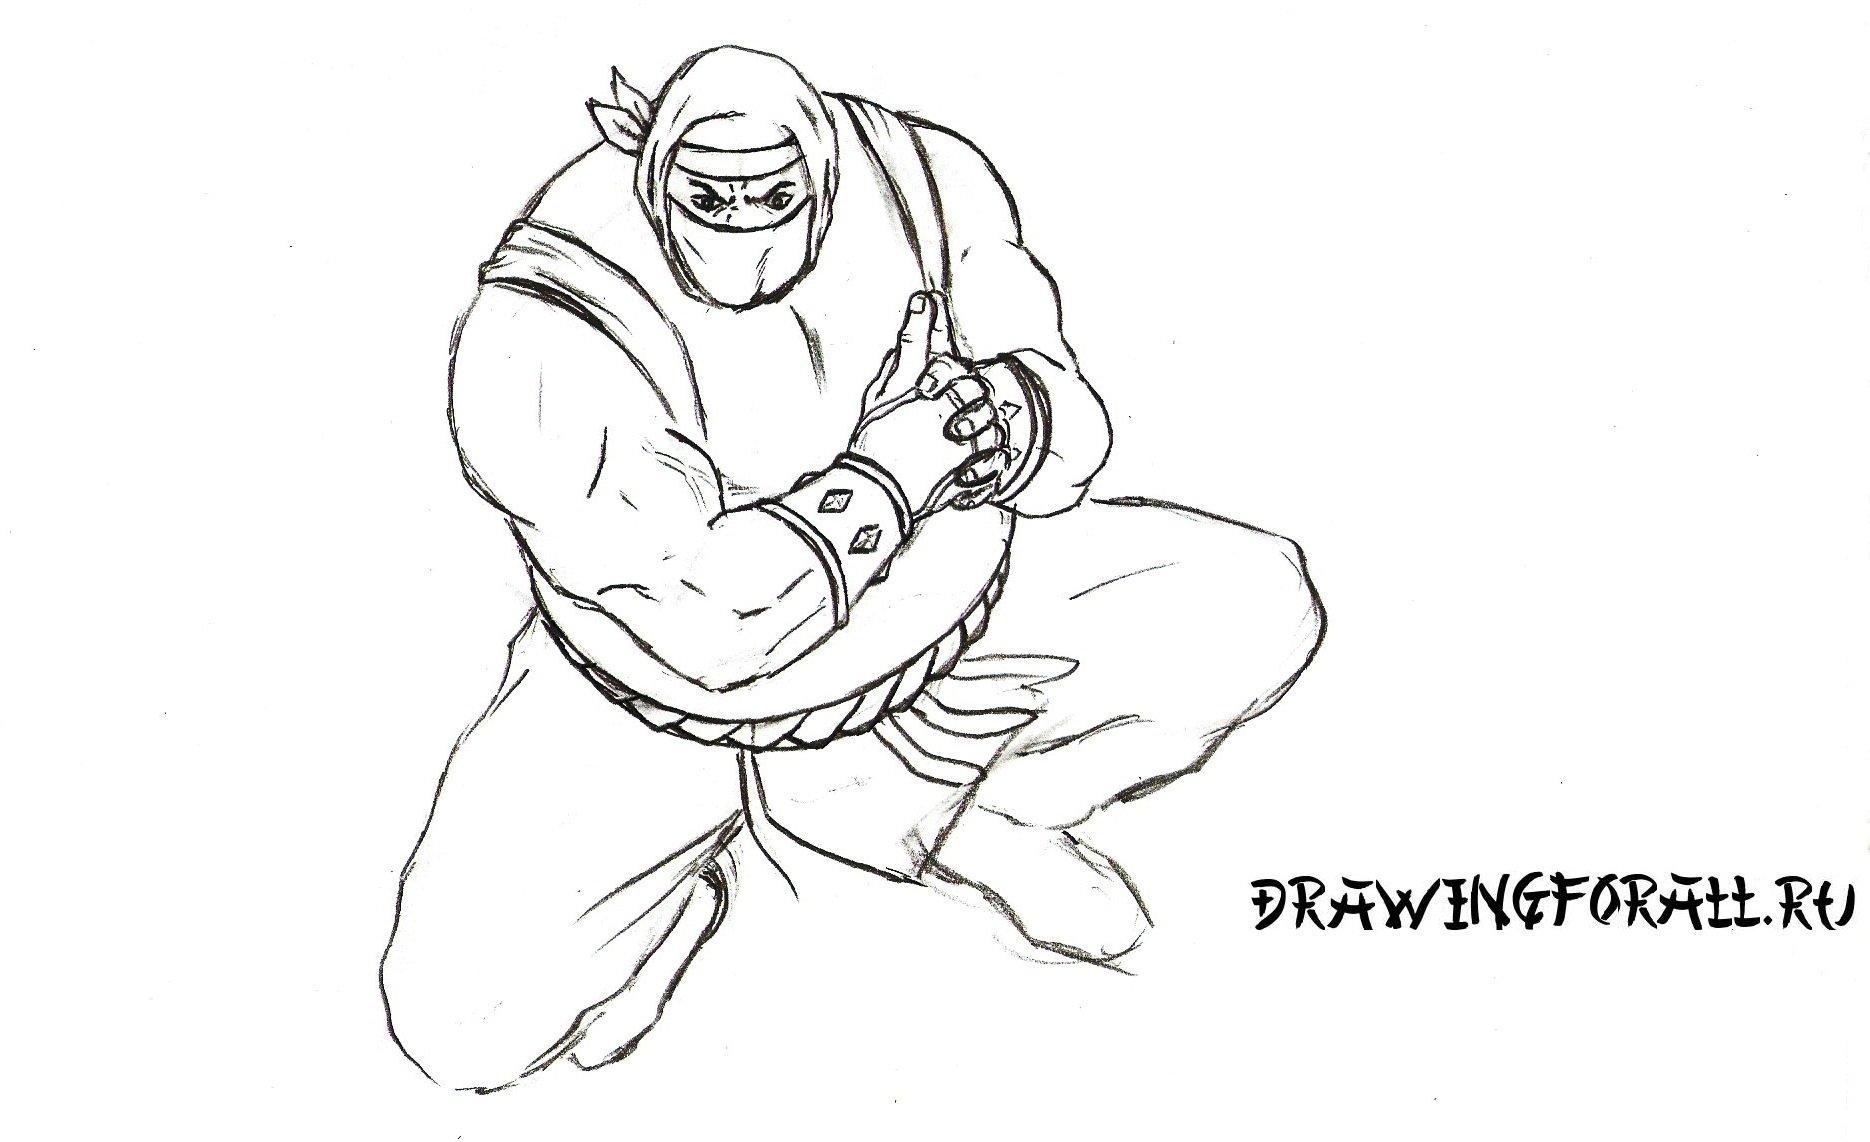 как нарисовать костюм ниндзя